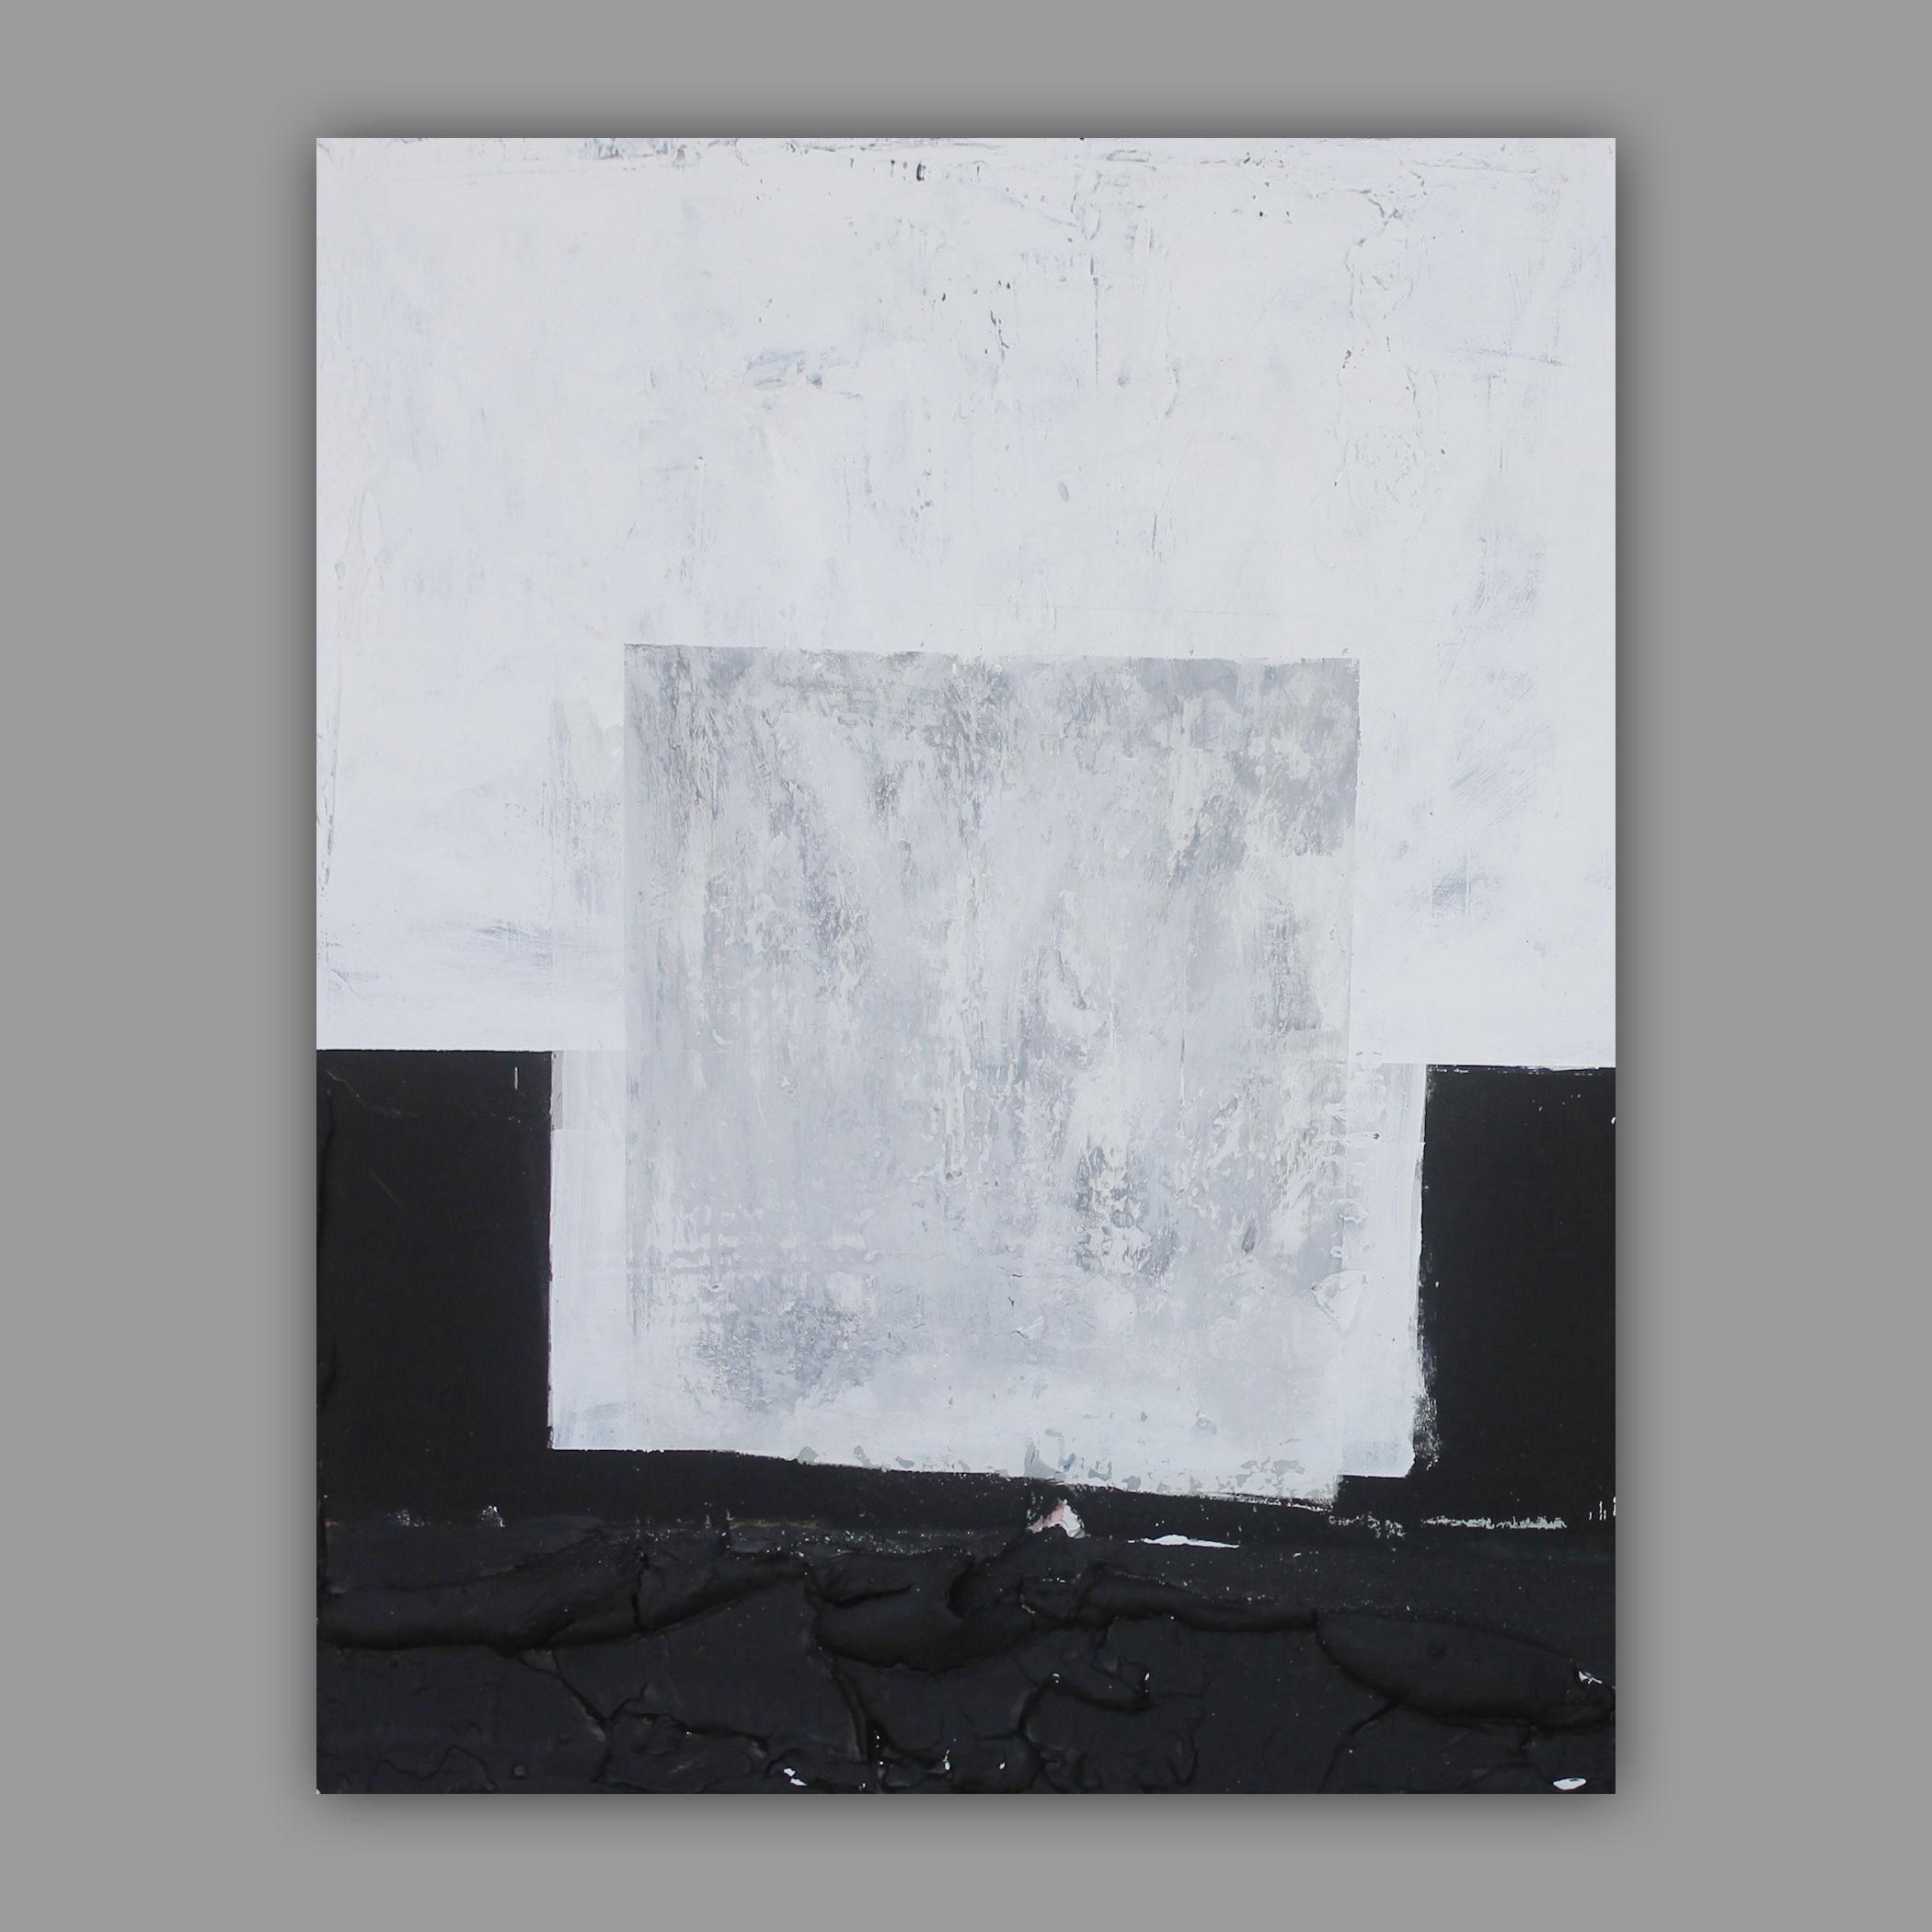 Untitled, (BlkNWht), 2018